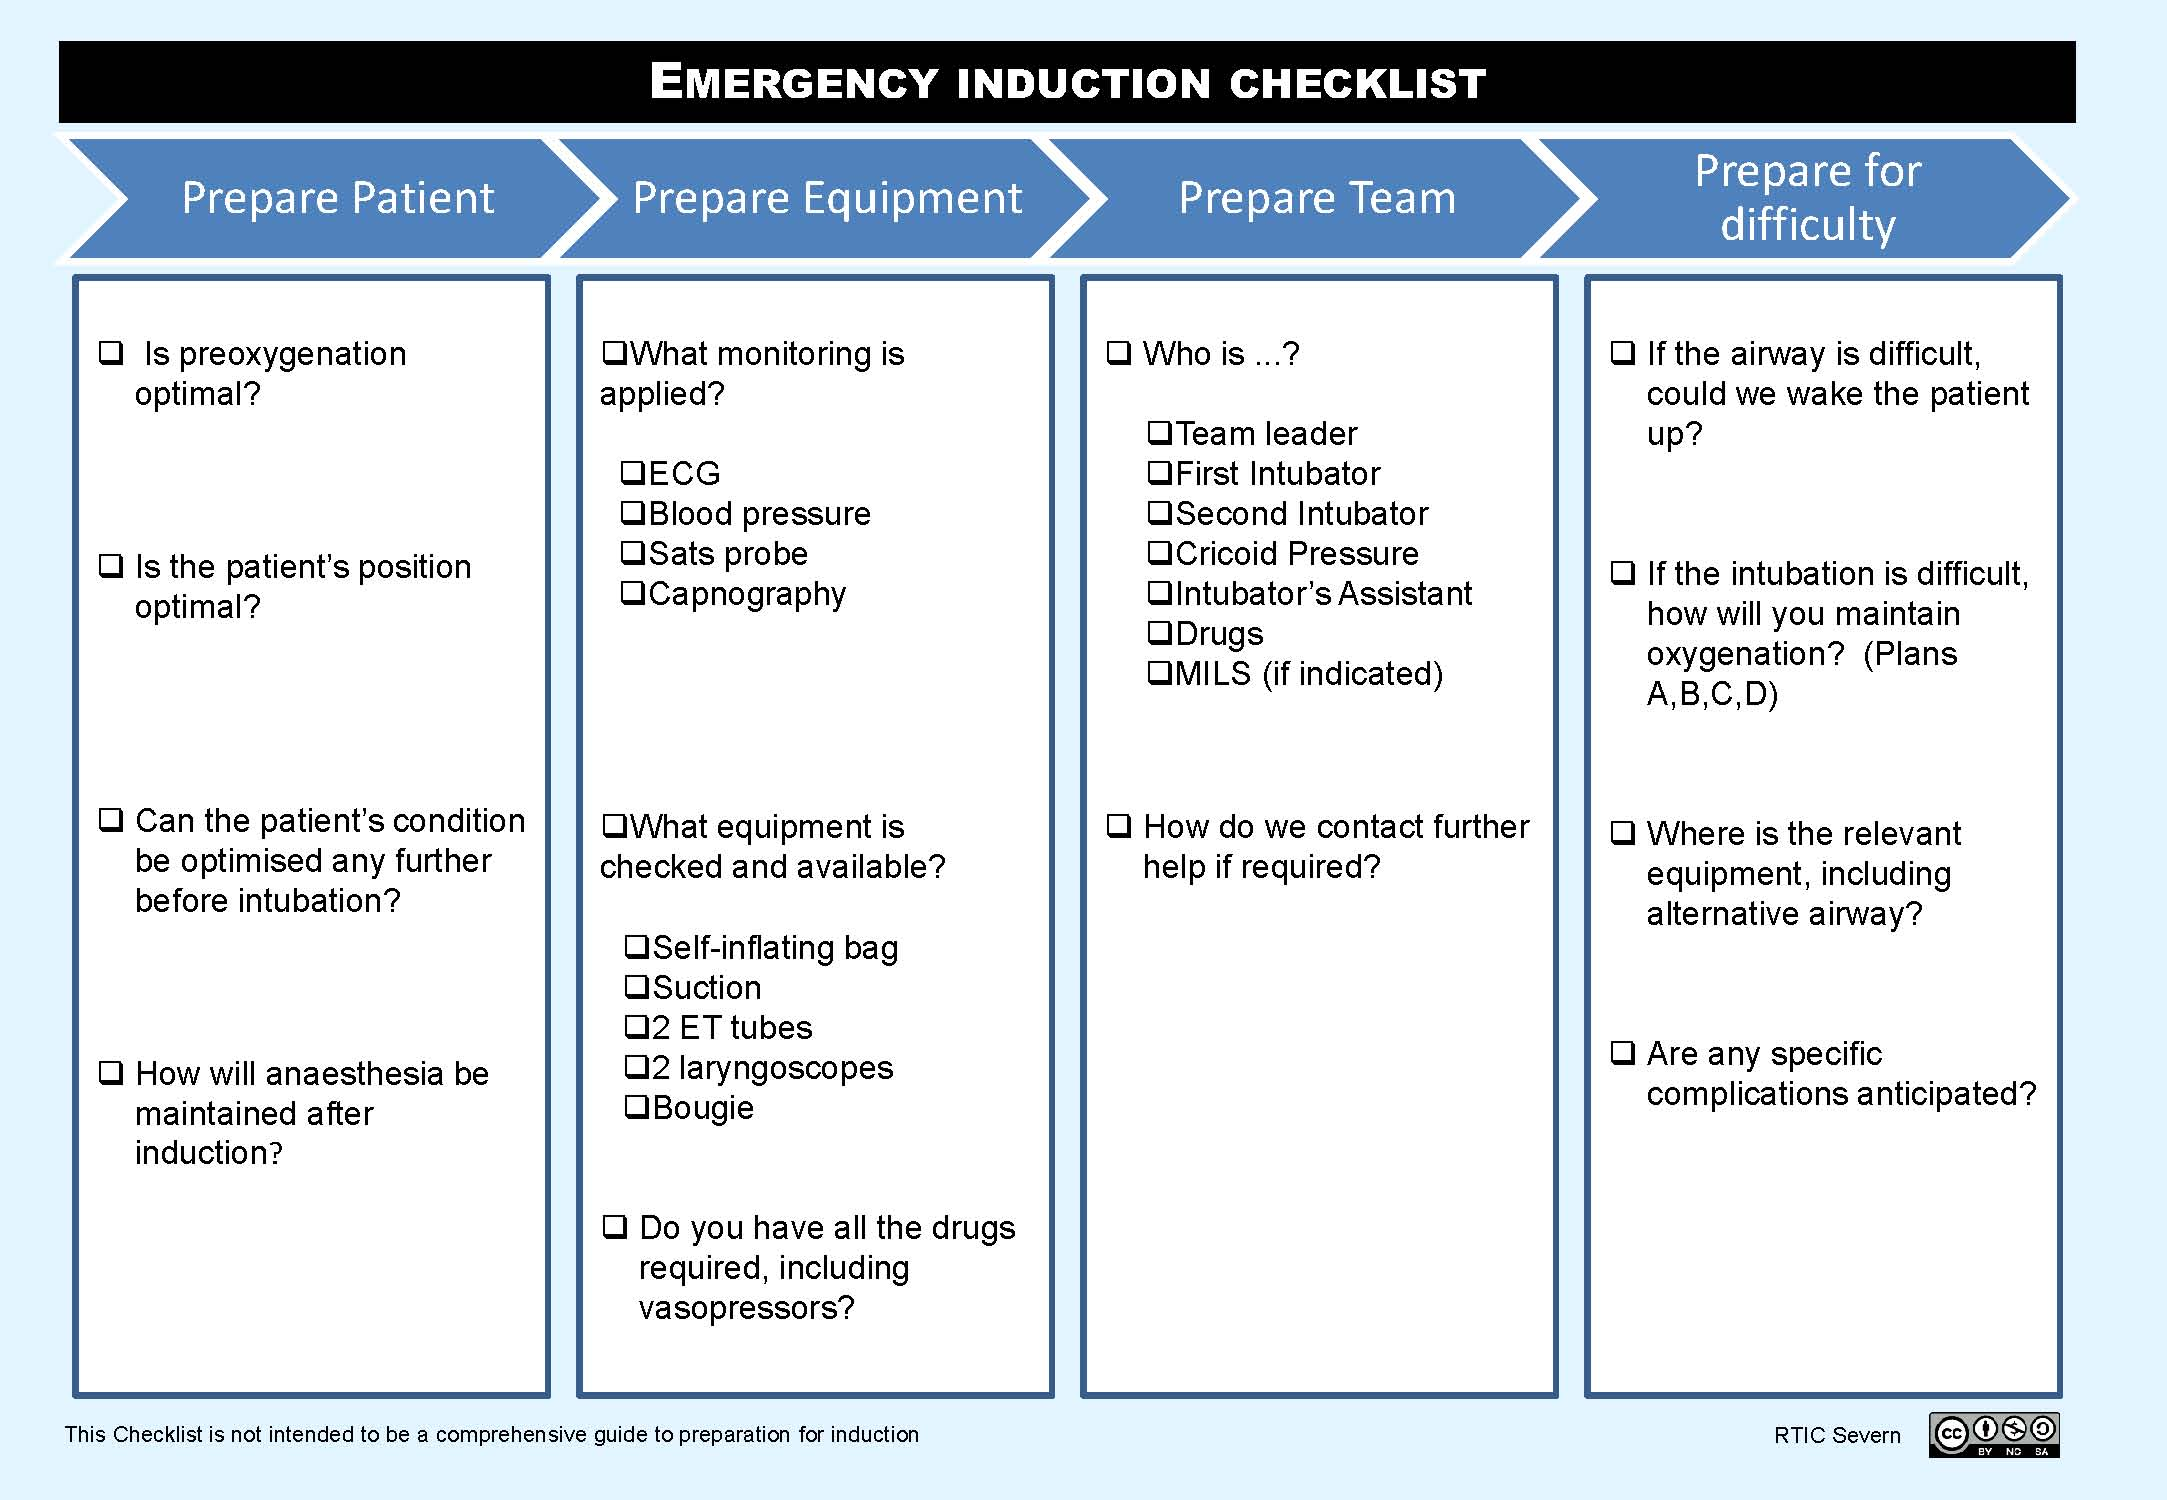 RTIC Severn checklist